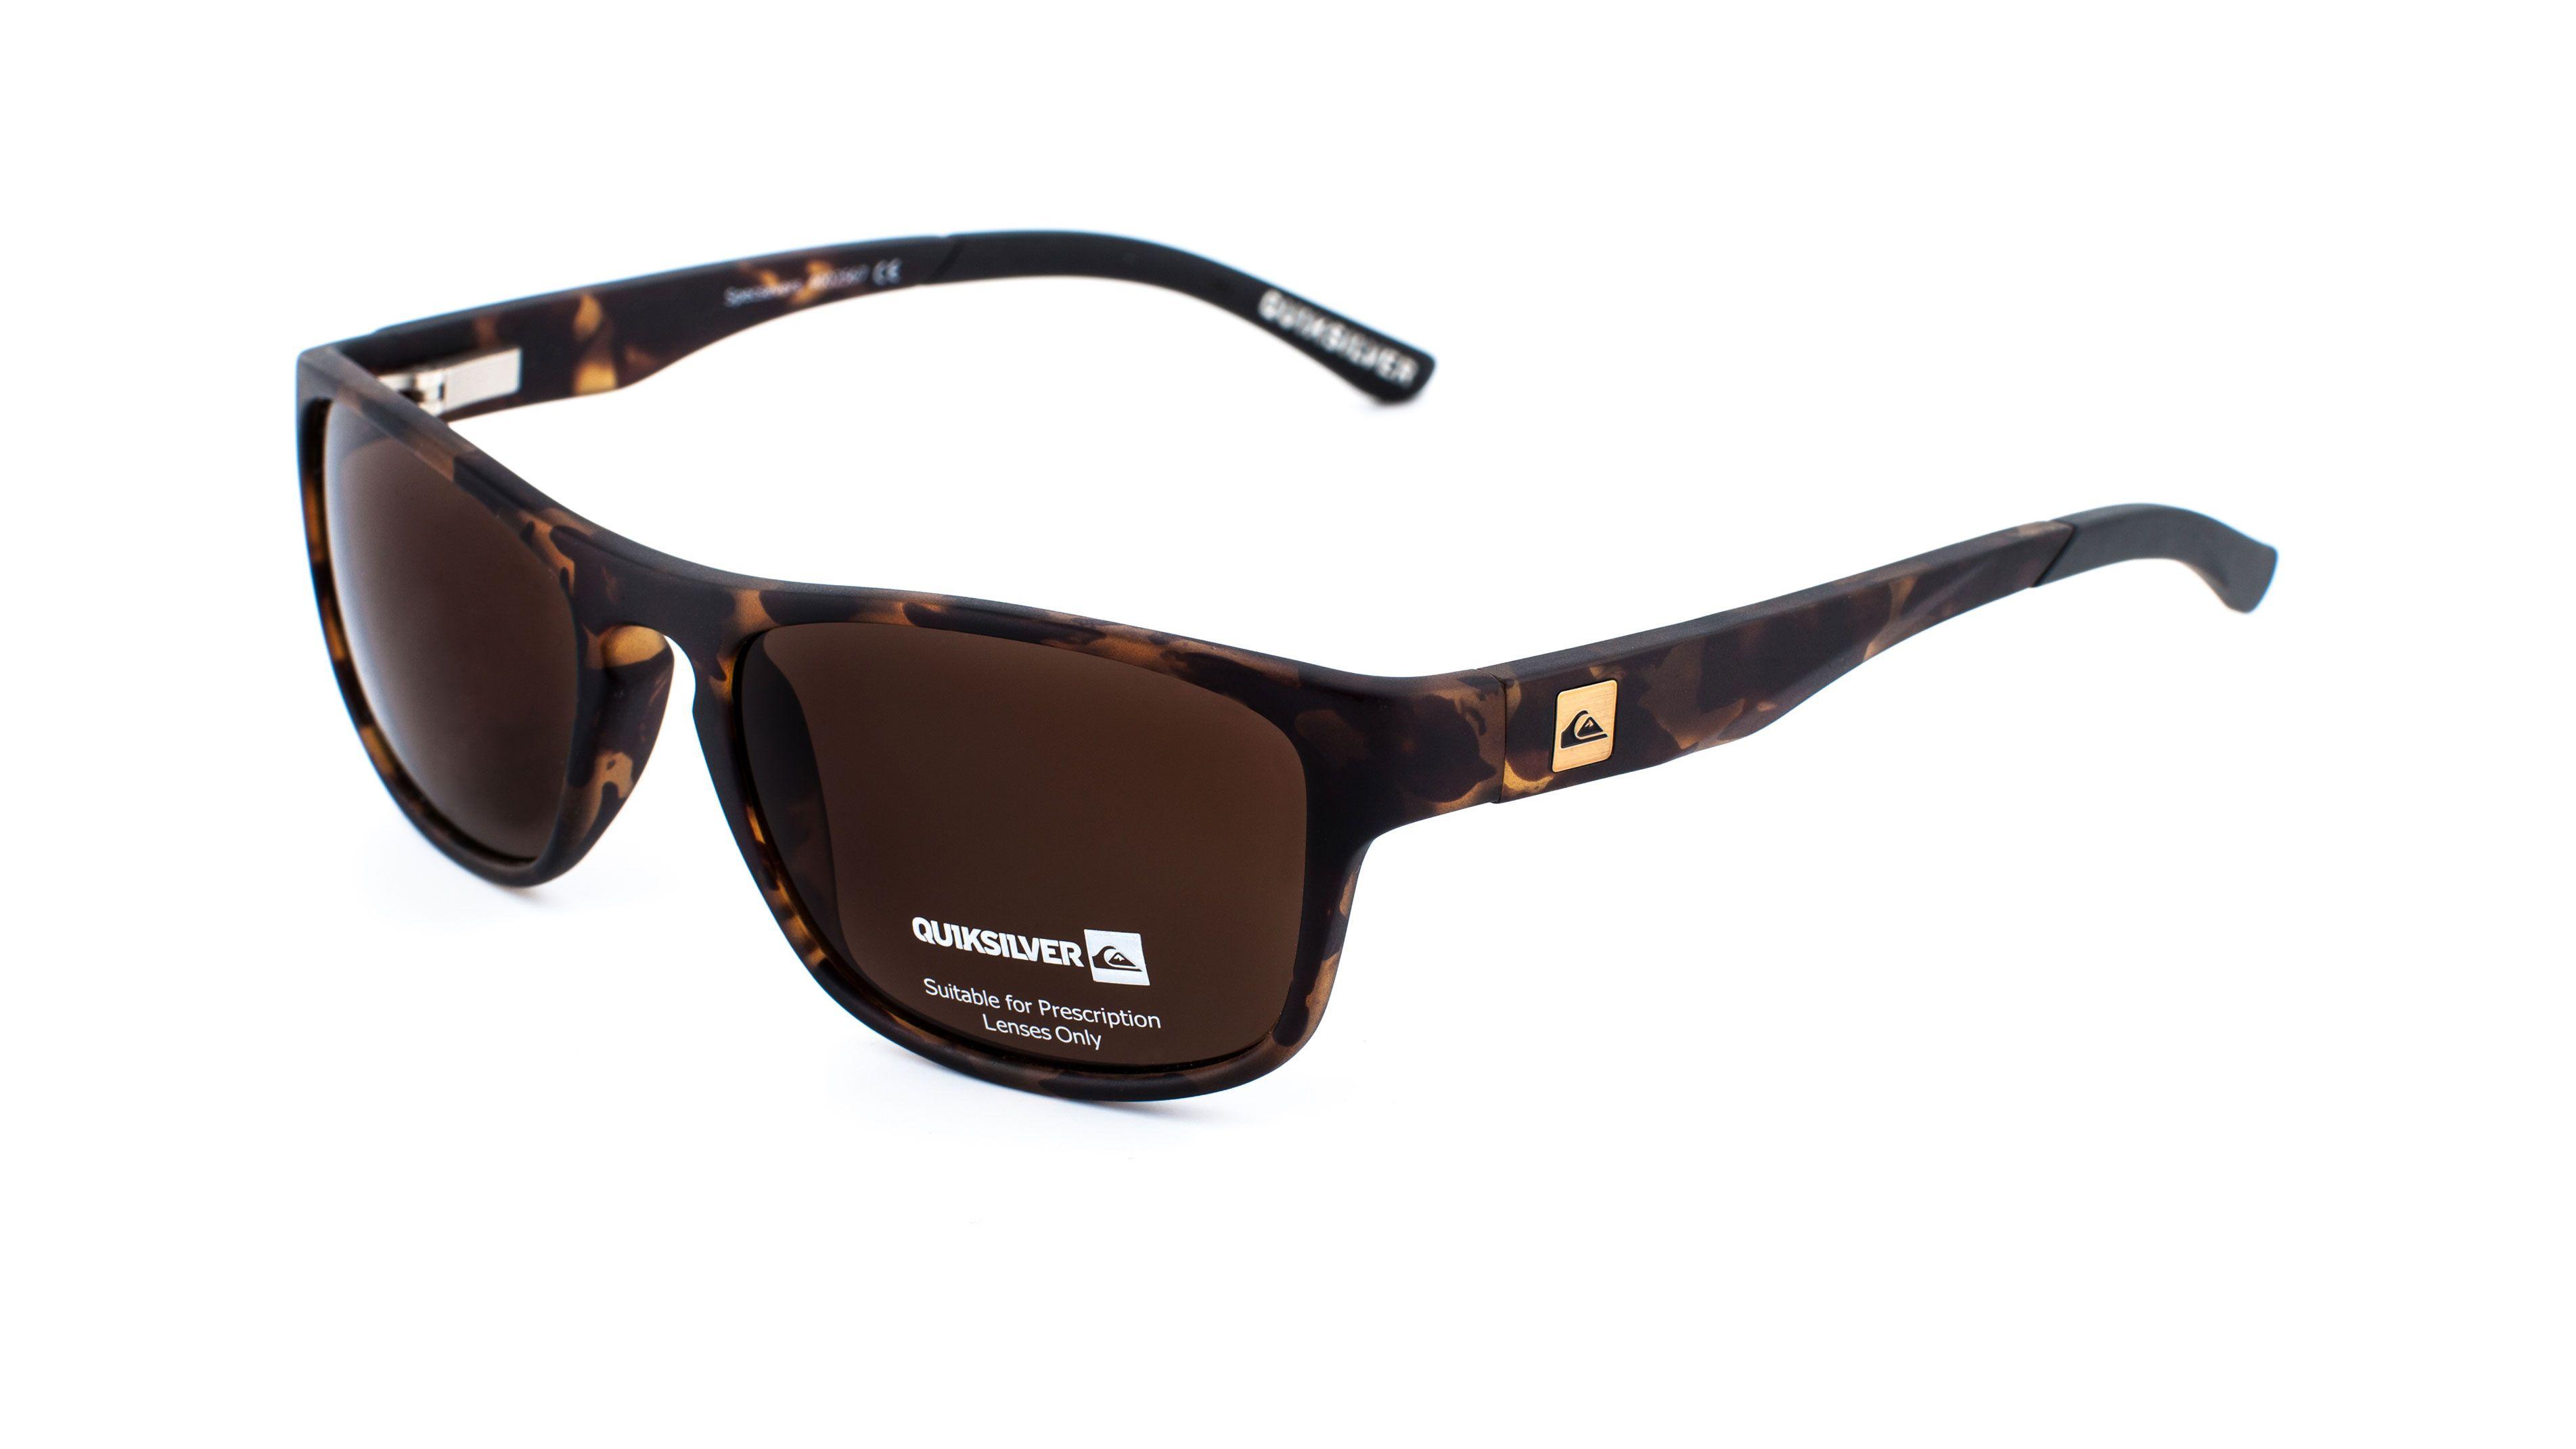 8cad08d64 QUIKSILVER SUN RX 98 Glasses by Quiksilver | Specsavers UK | Glasses ...